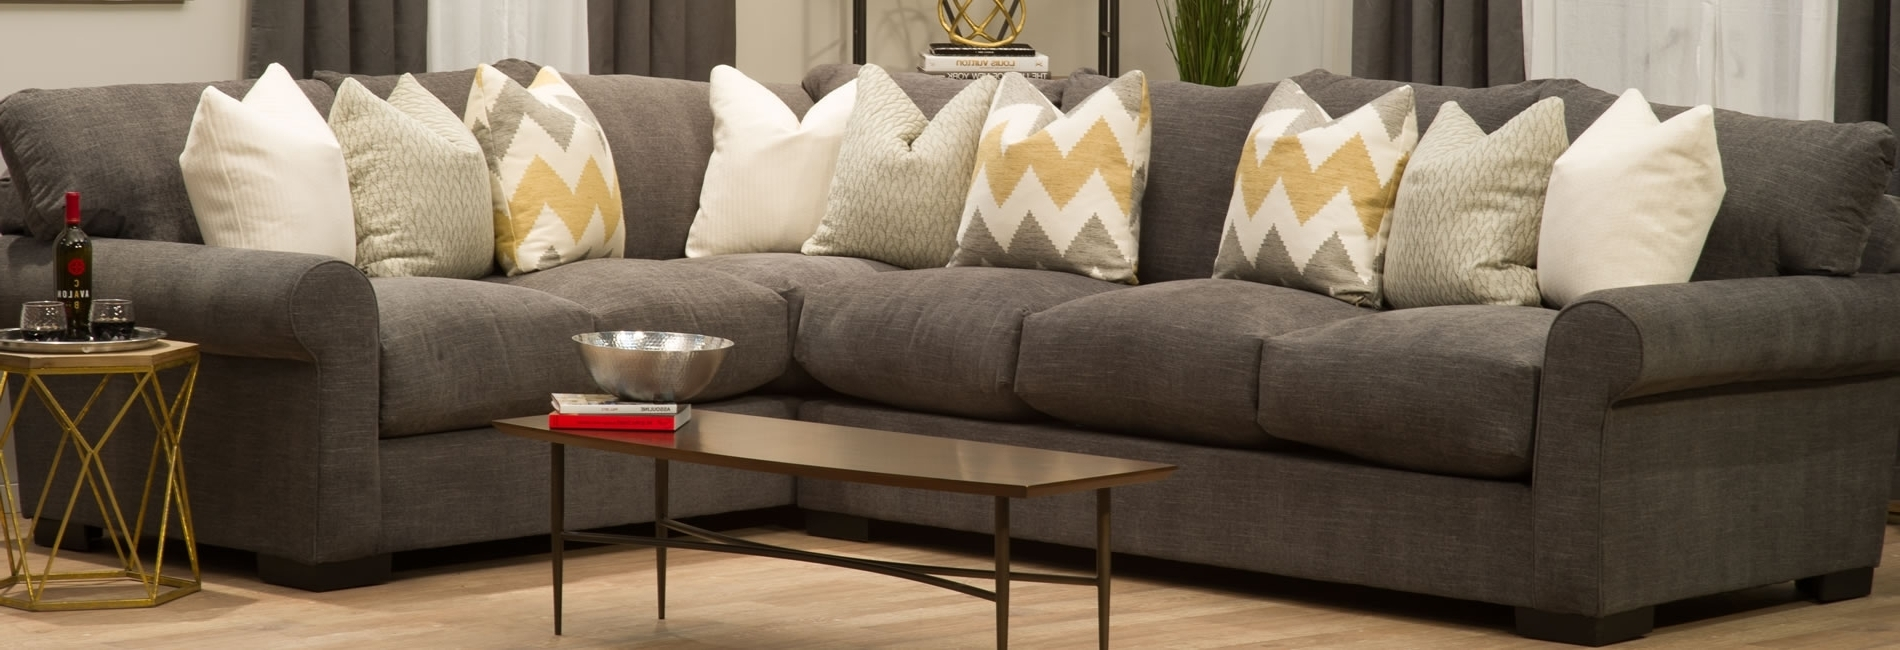 Sectional Sofas In Atlanta Regarding Favorite Collection Sectional Sofas Atlanta Ga – Buildsimplehome (View 3 of 15)